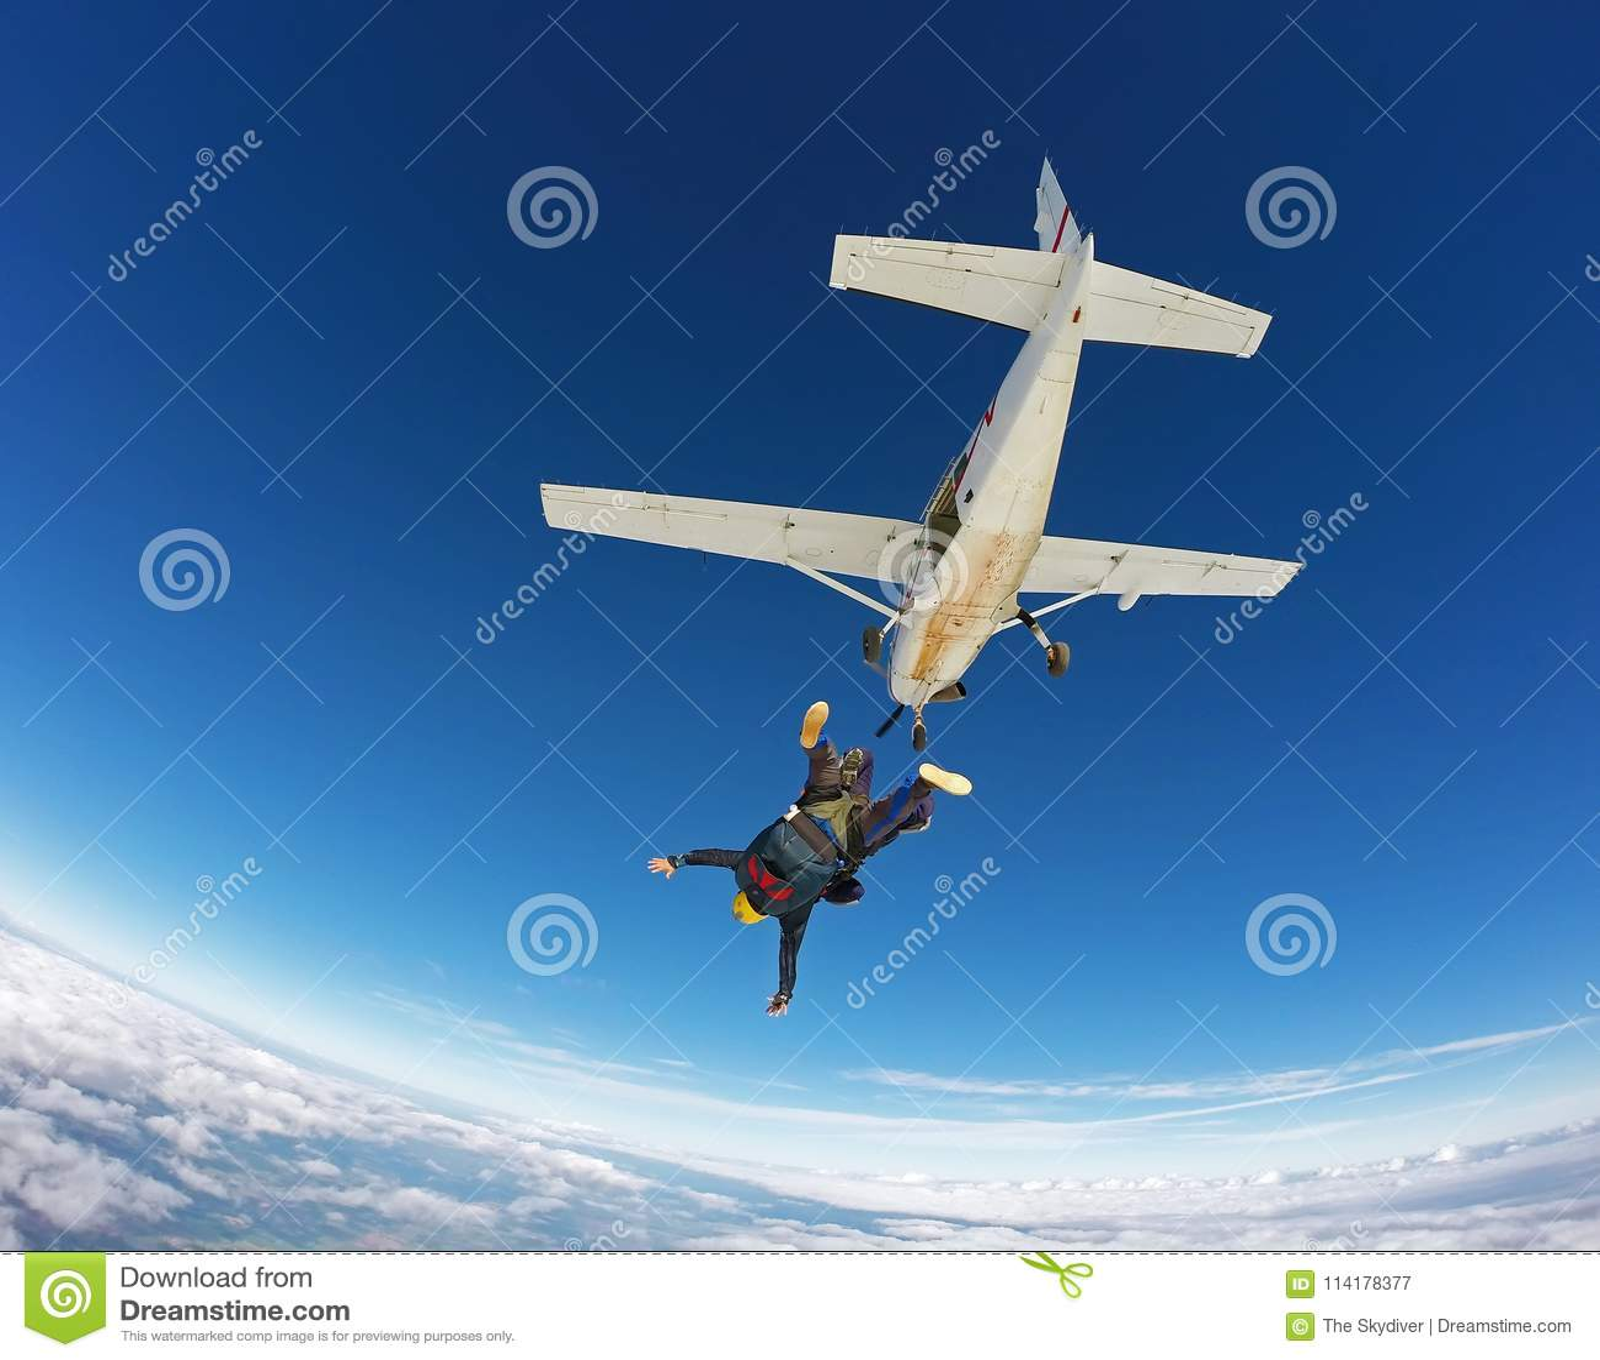 Skydiving纵排跃迁